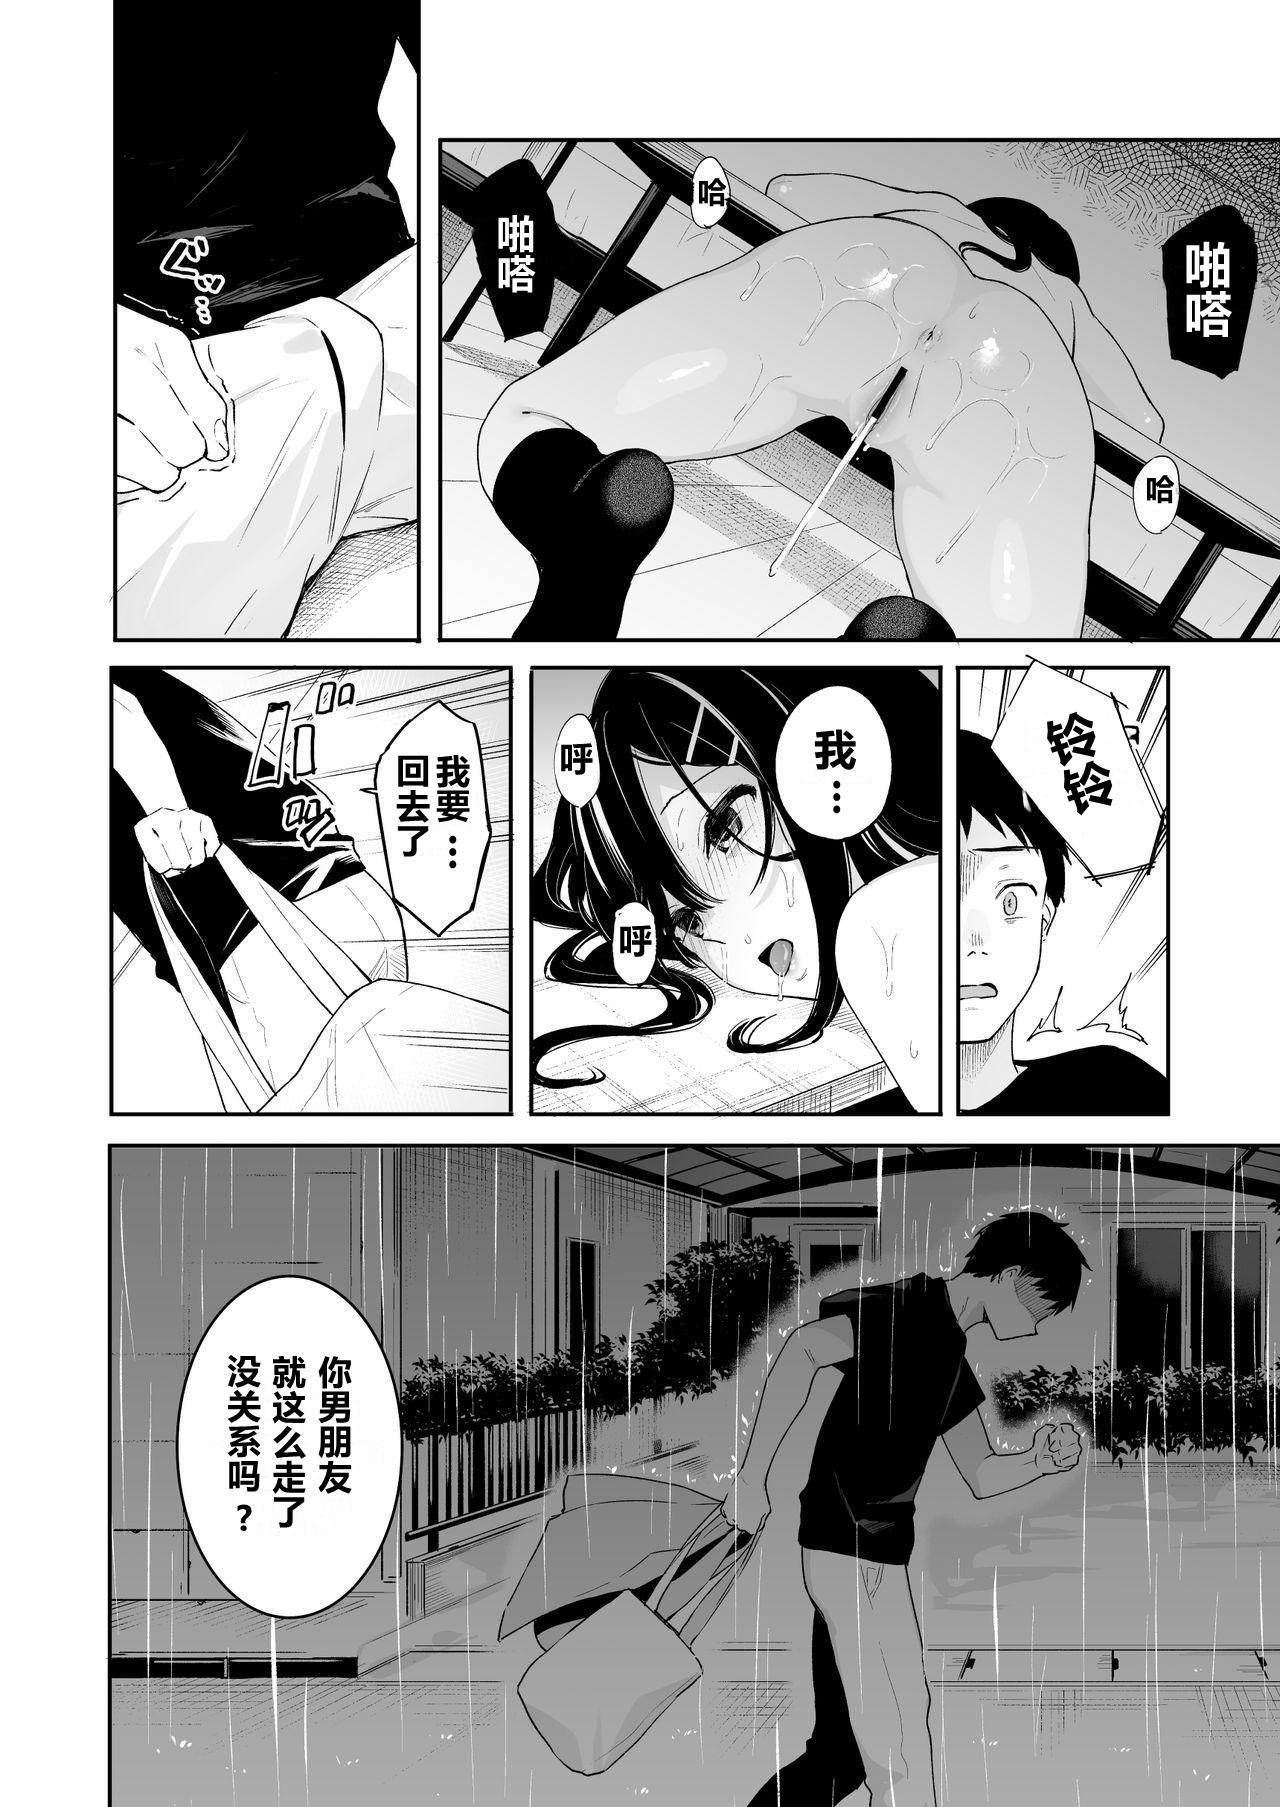 Itomusubi Vol. 4 34